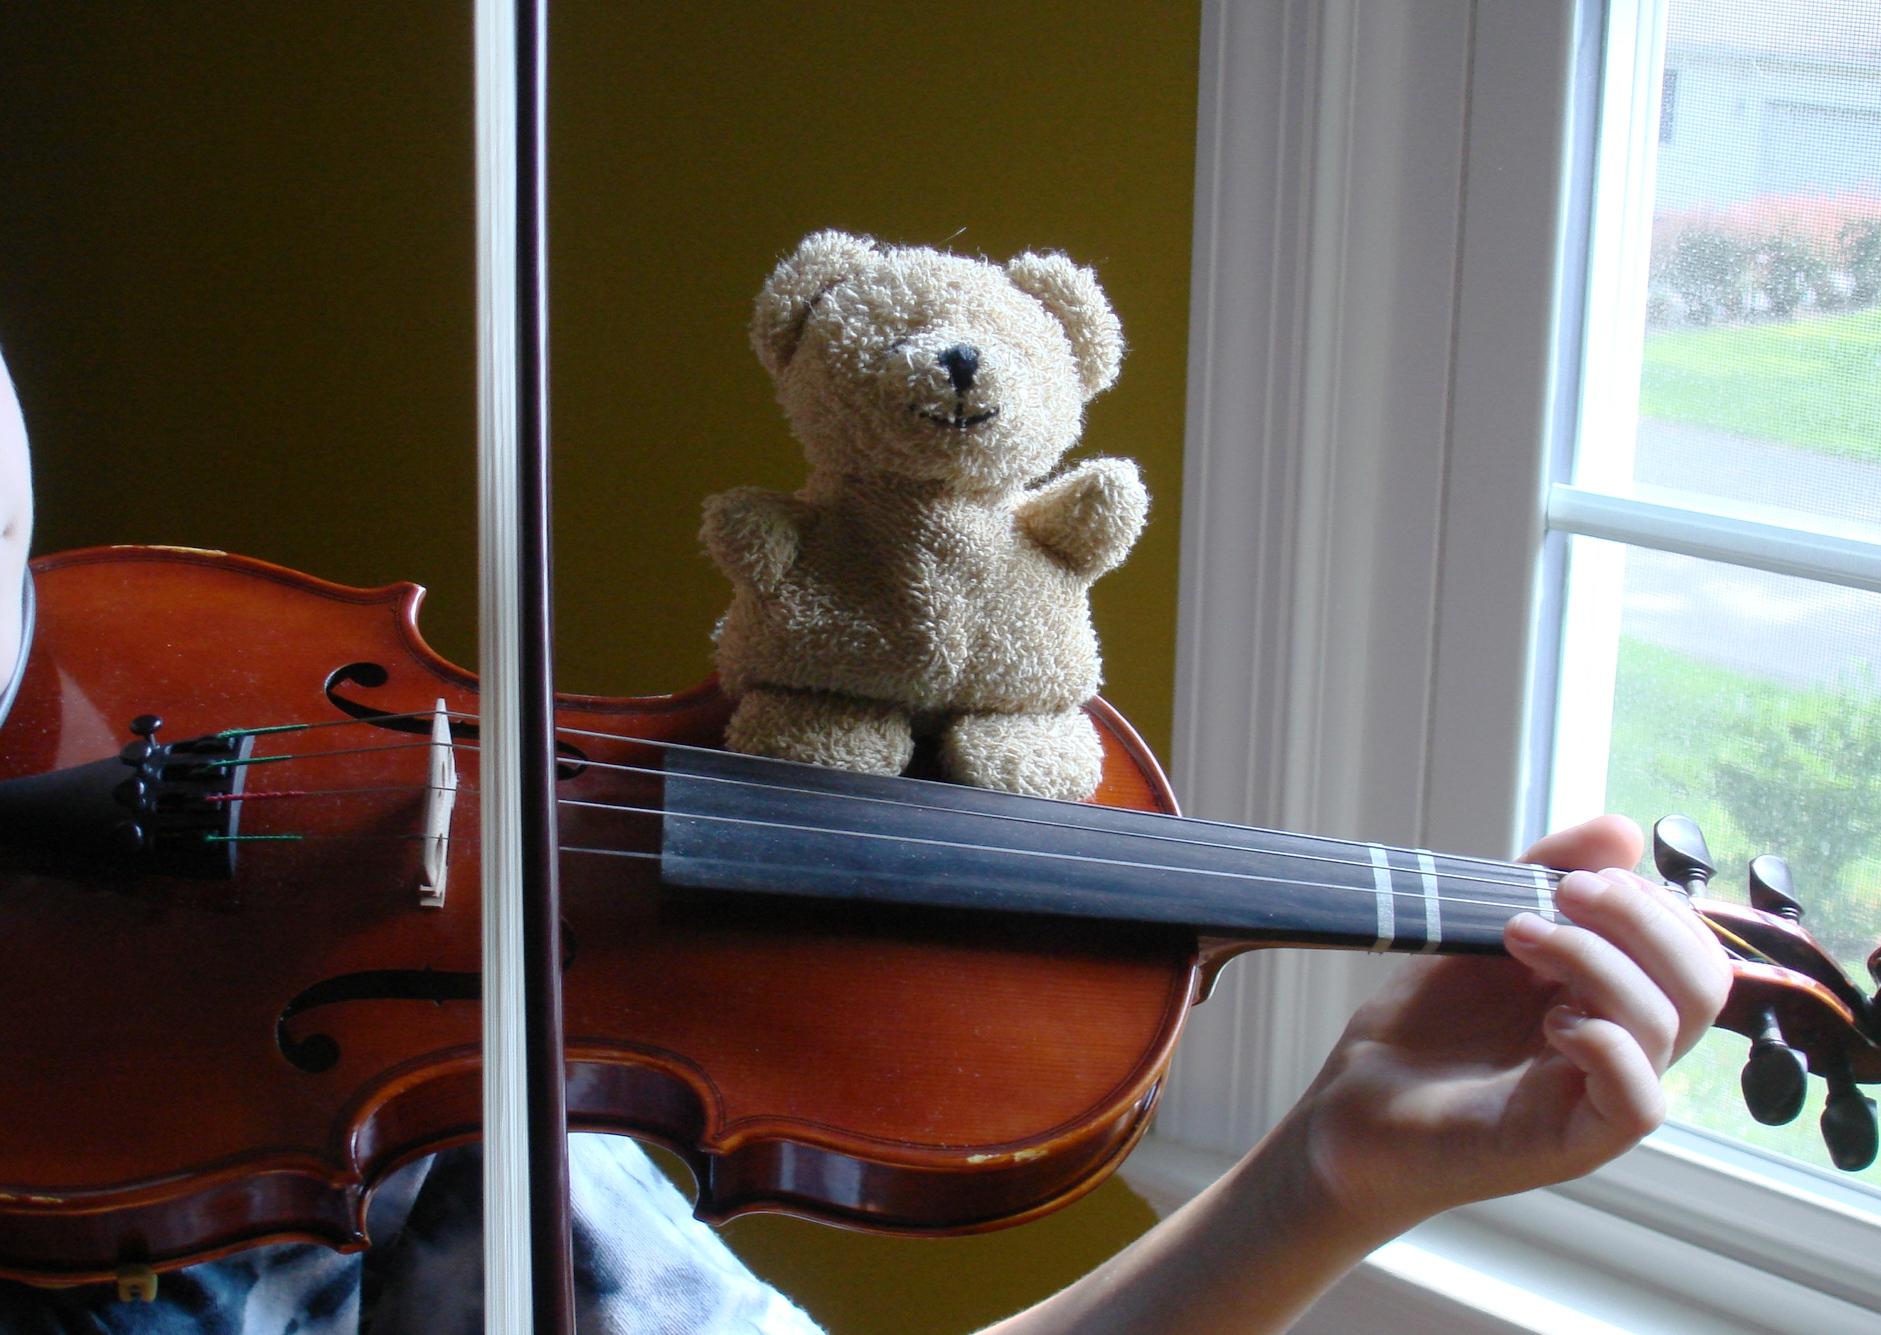 Stuffed_Bear_on_Violin.JPG